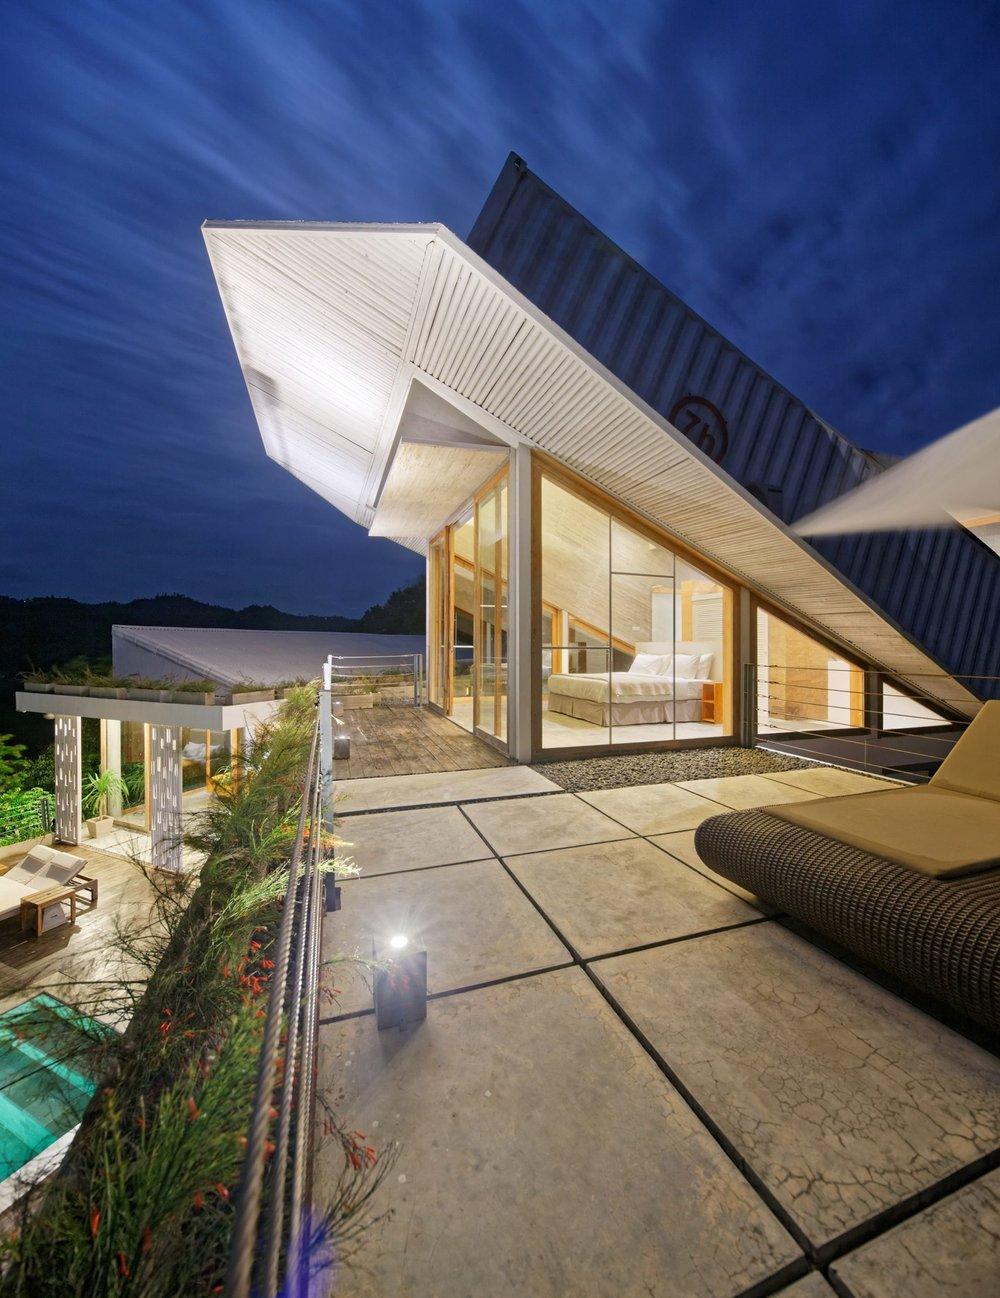 clay-house-budi-pradono-architects-architecture_dezeen_2364_col_14-1704x2211.jpg